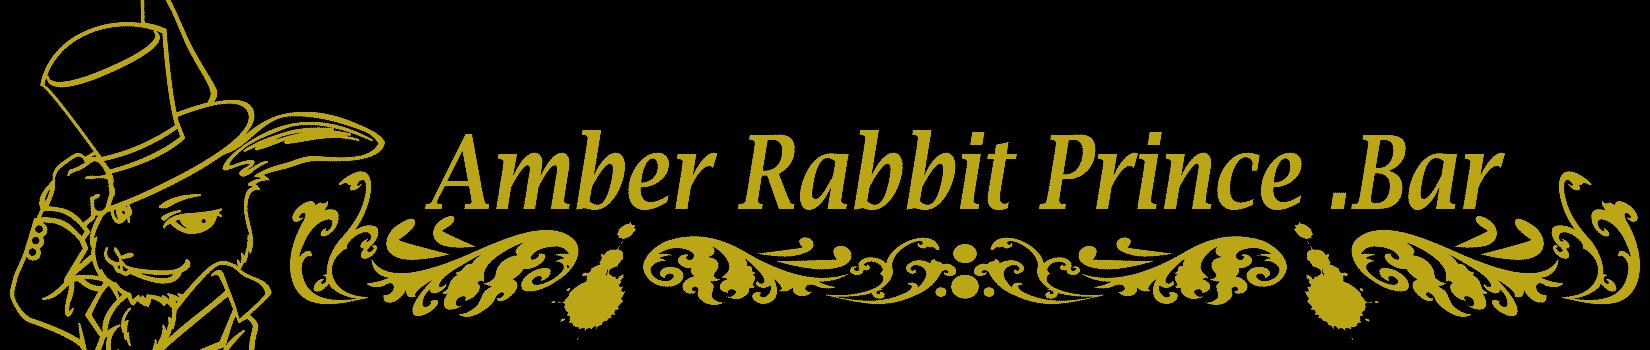 Amber Rabbit Prince .Bar